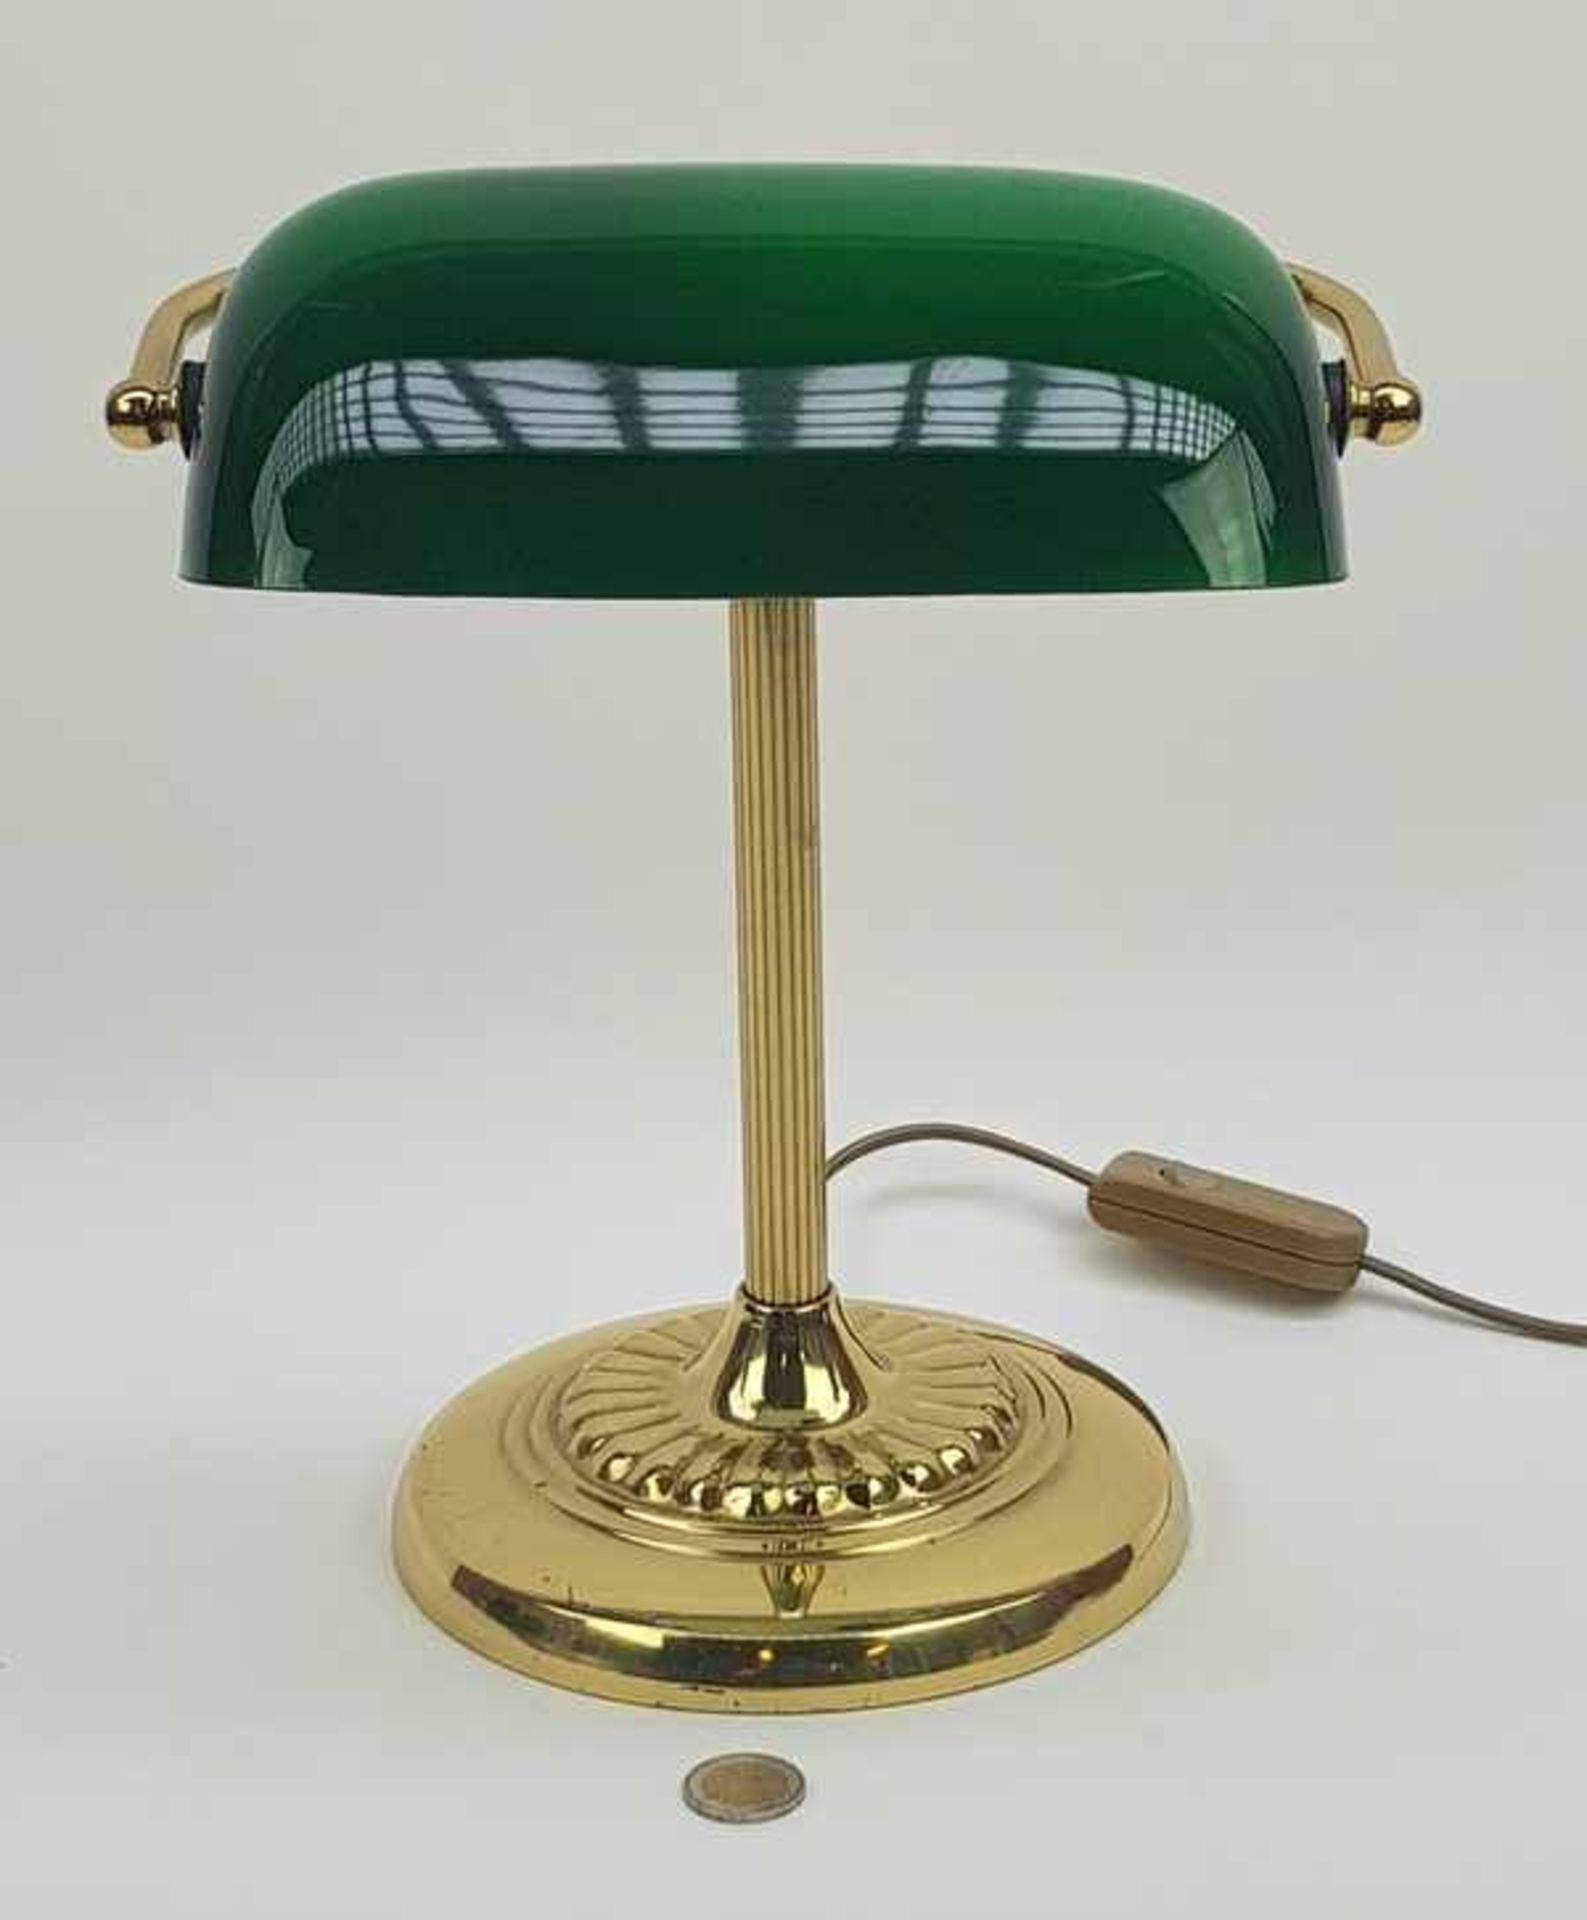 (Curiosa) Bureaulamp - Bild 3 aus 5